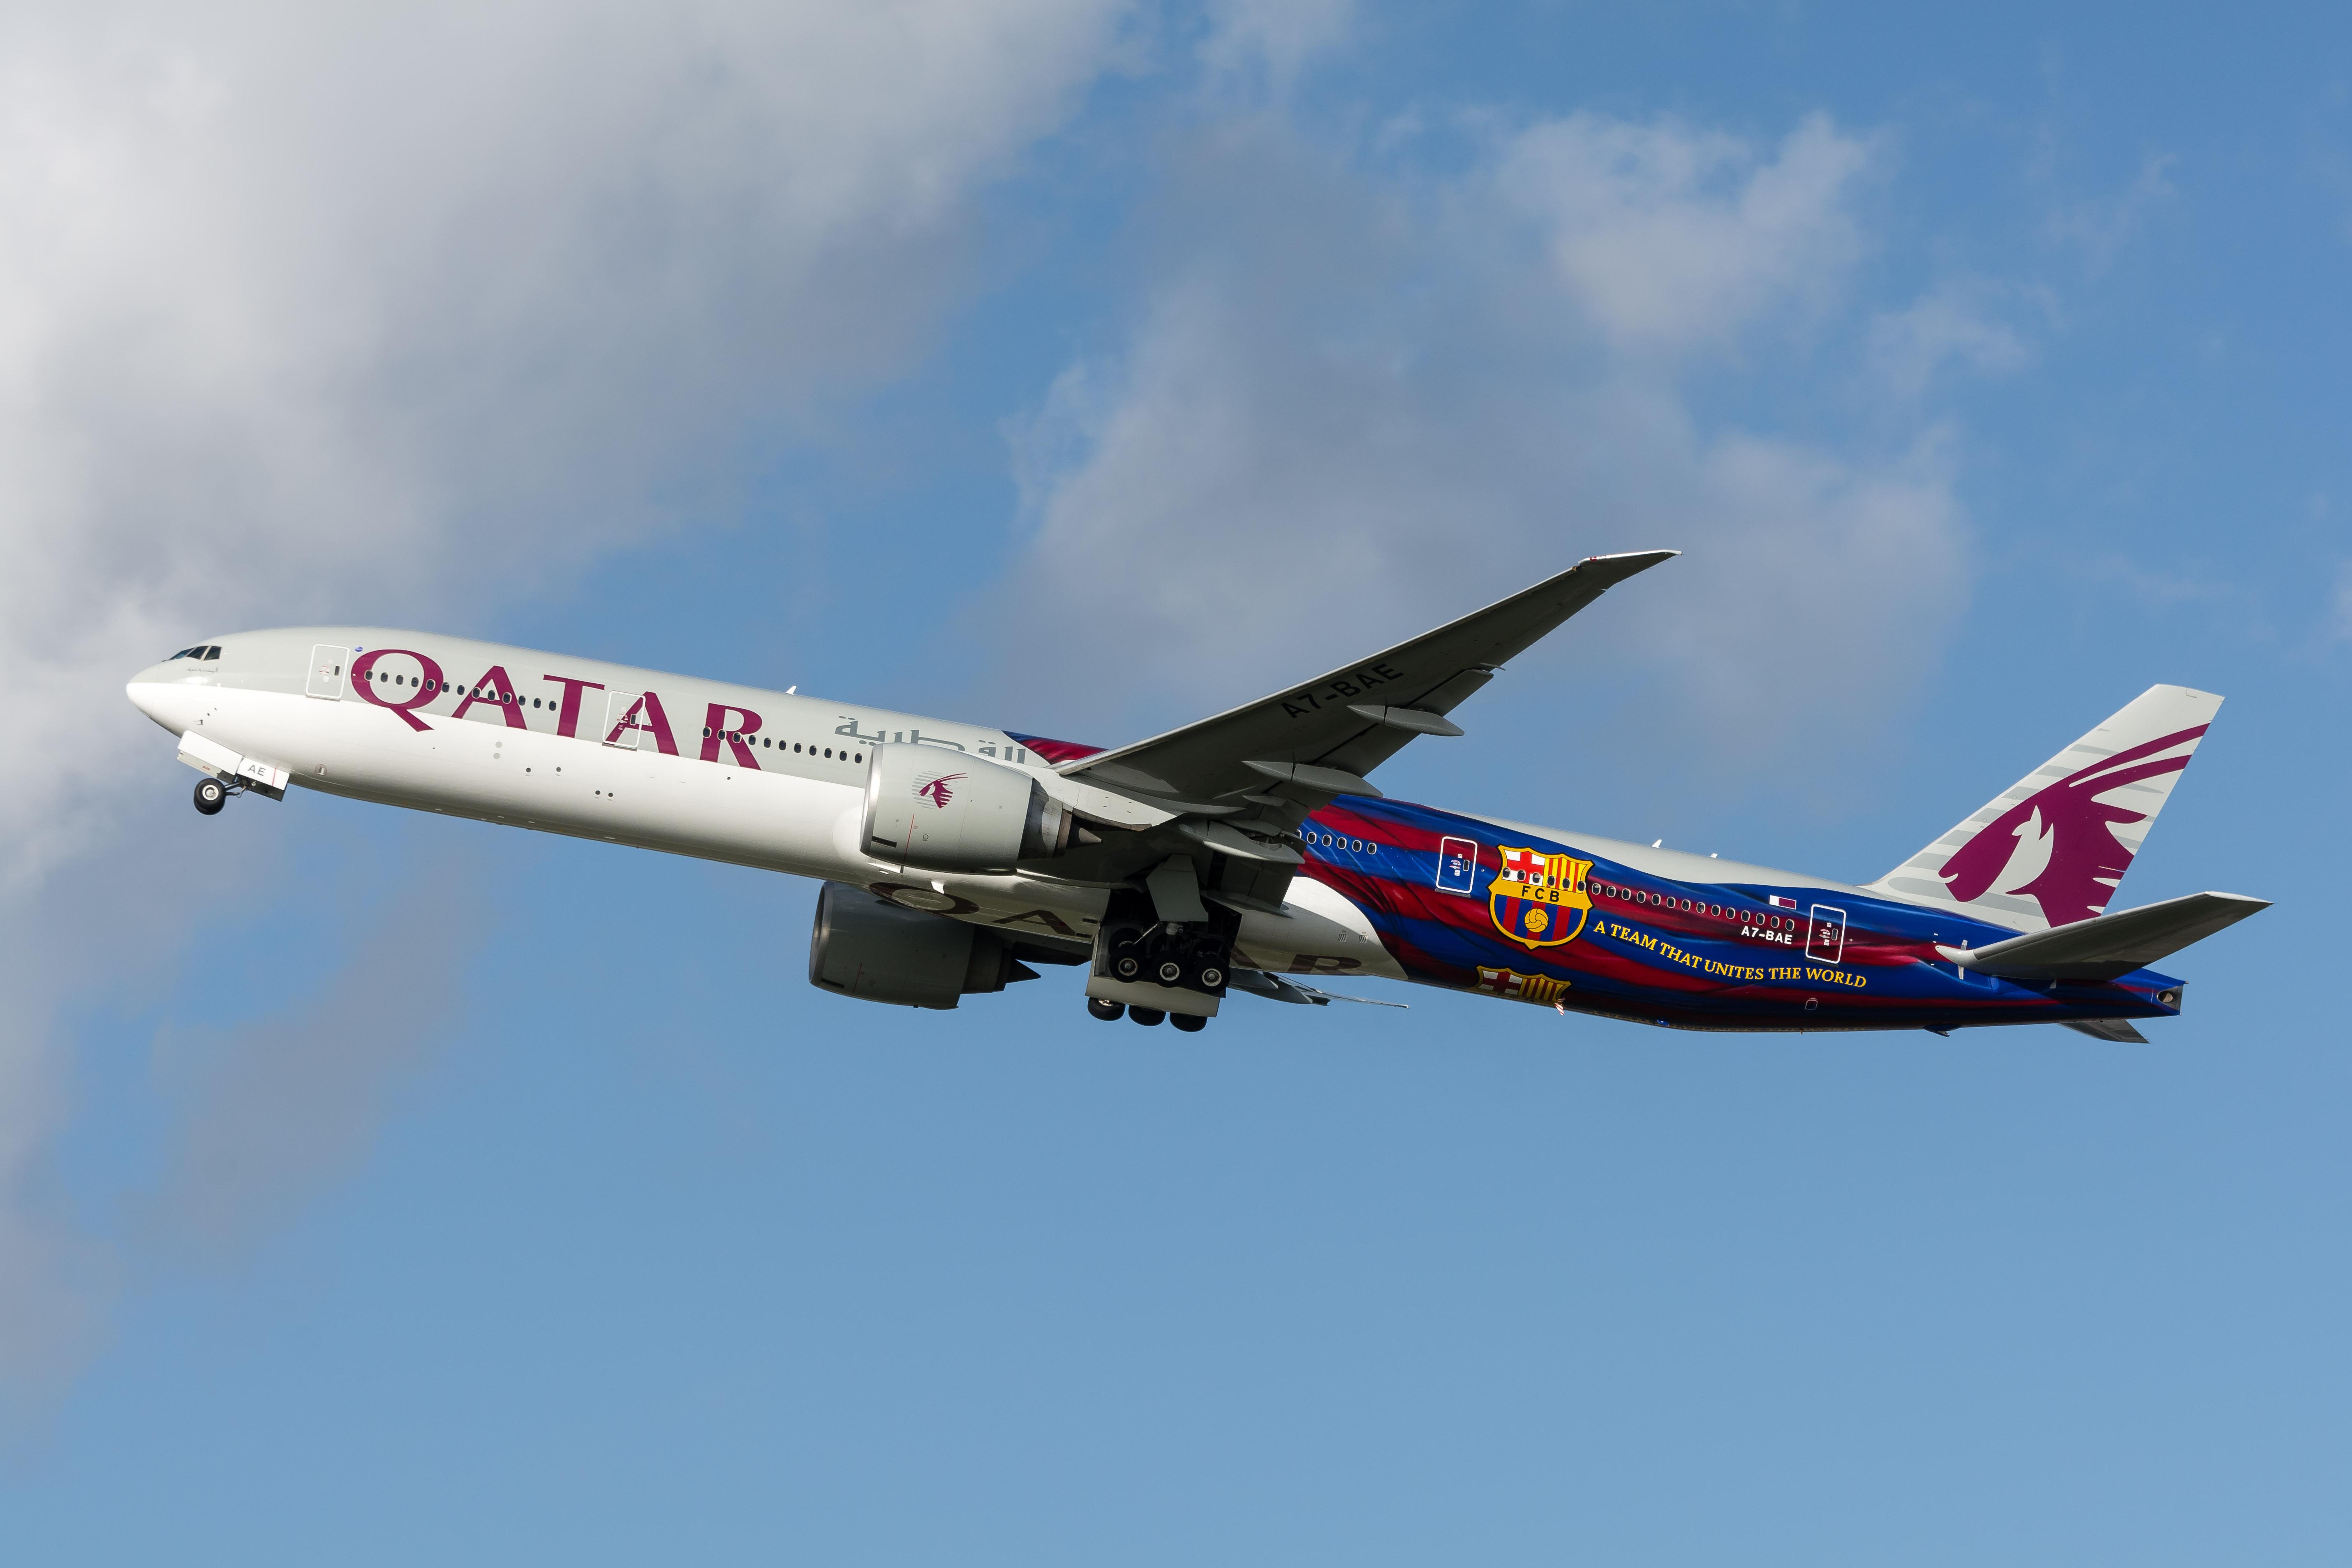 Avió de Qatar Airways, patrocinador del Barça / PETER RUSSELL